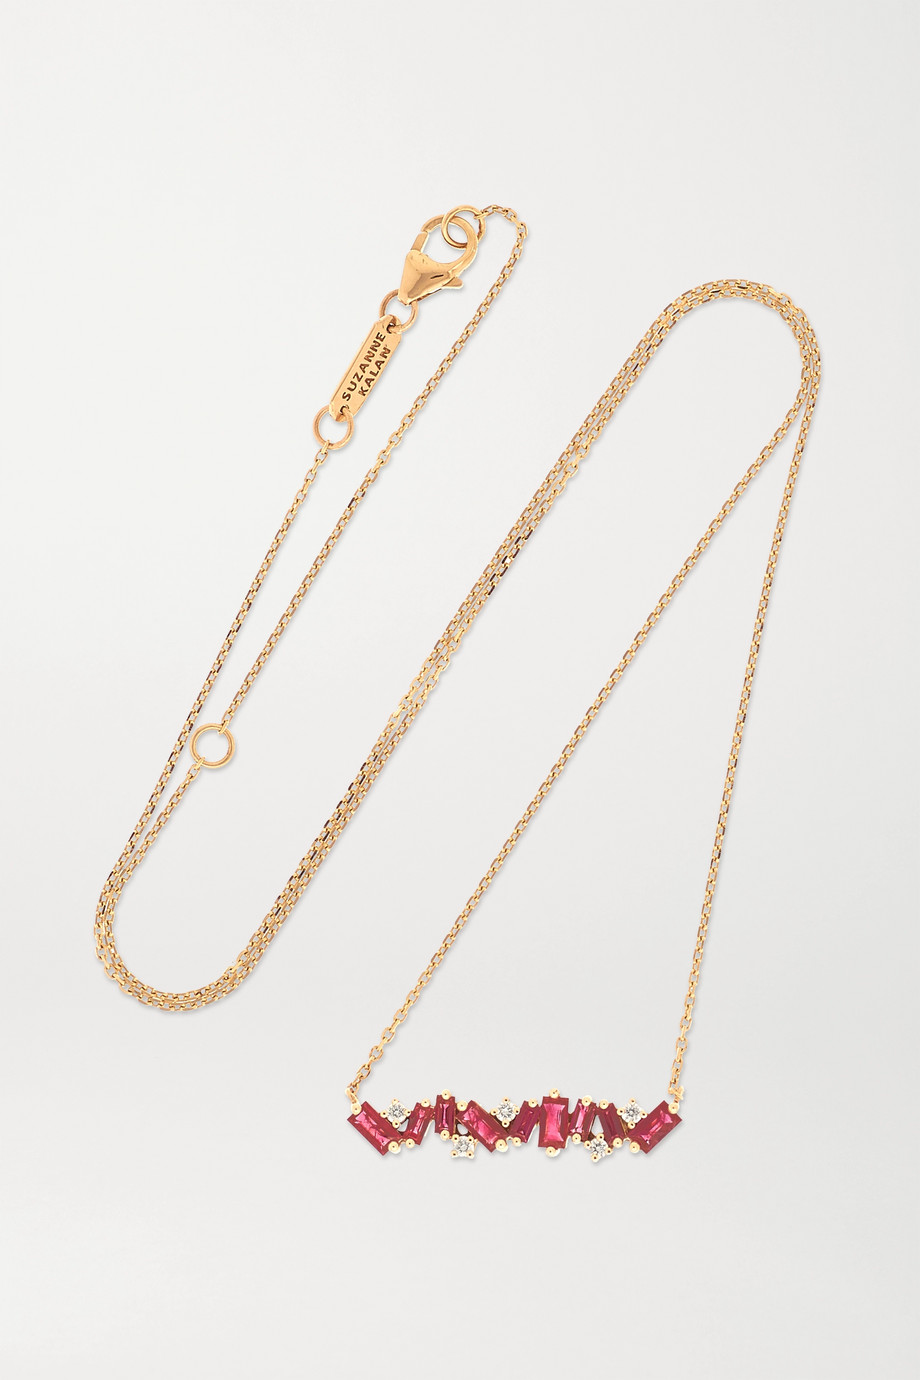 Suzanne Kalan 18K 玫瑰金、红宝石、钻石项链